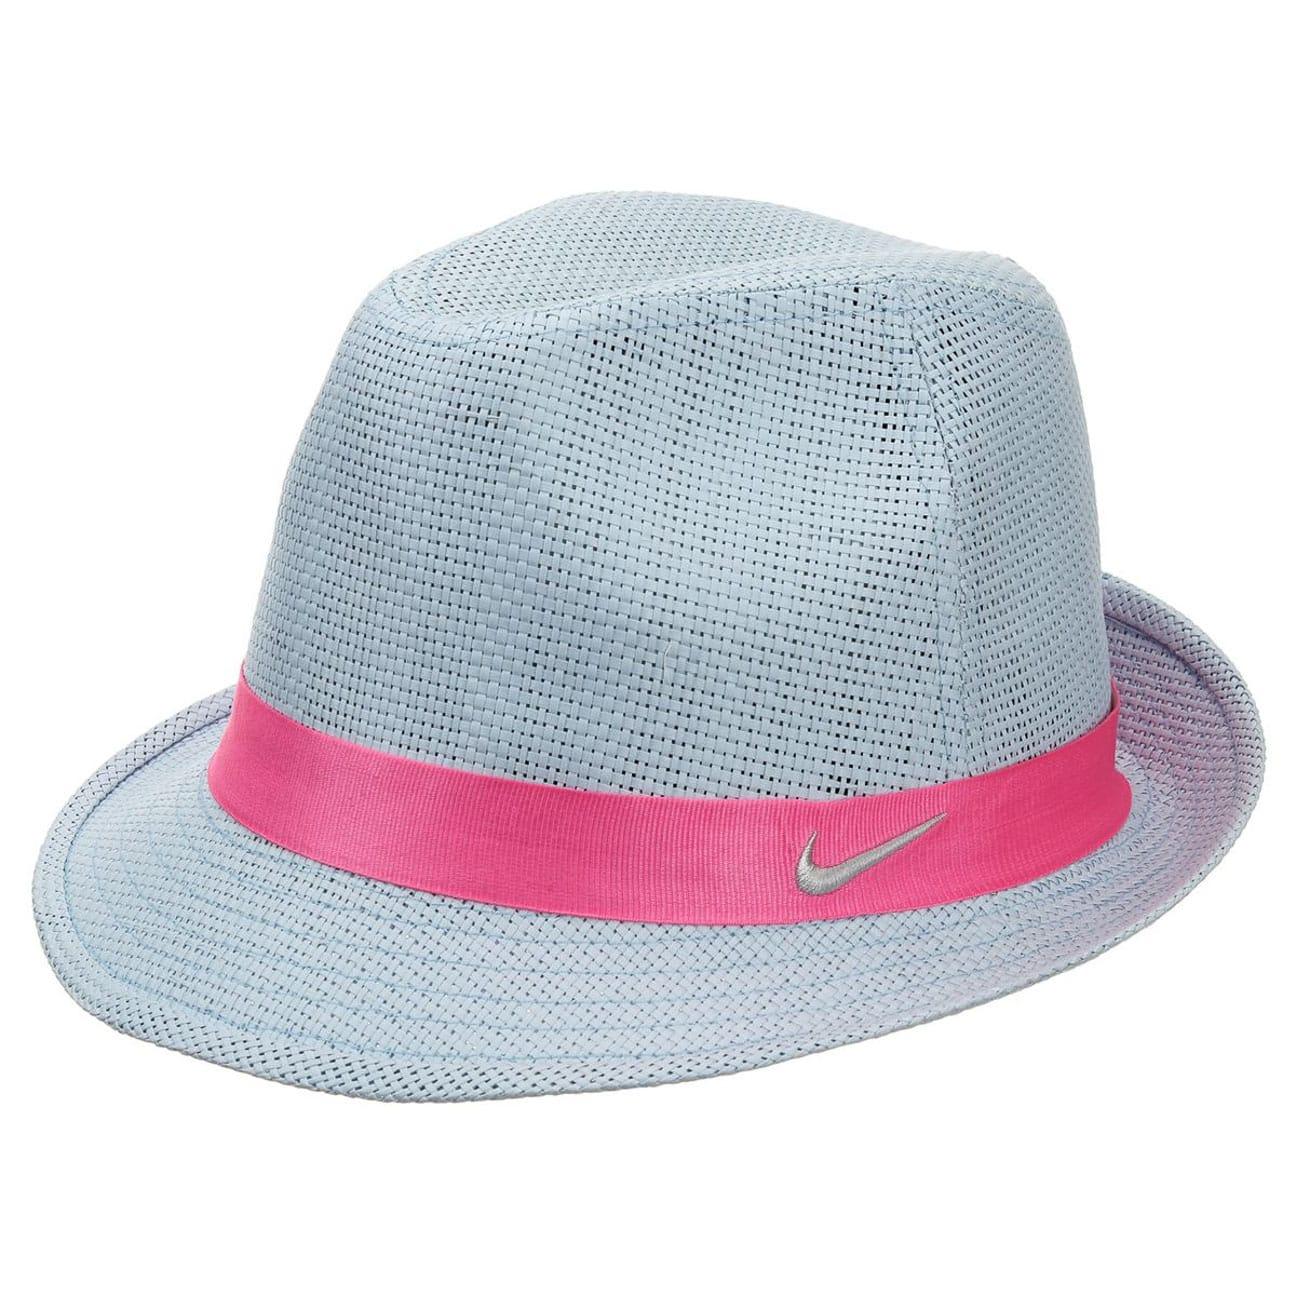 Women´s Golf Fedora Straw Hat by Nike - light blue 1 d728d1cf1b3